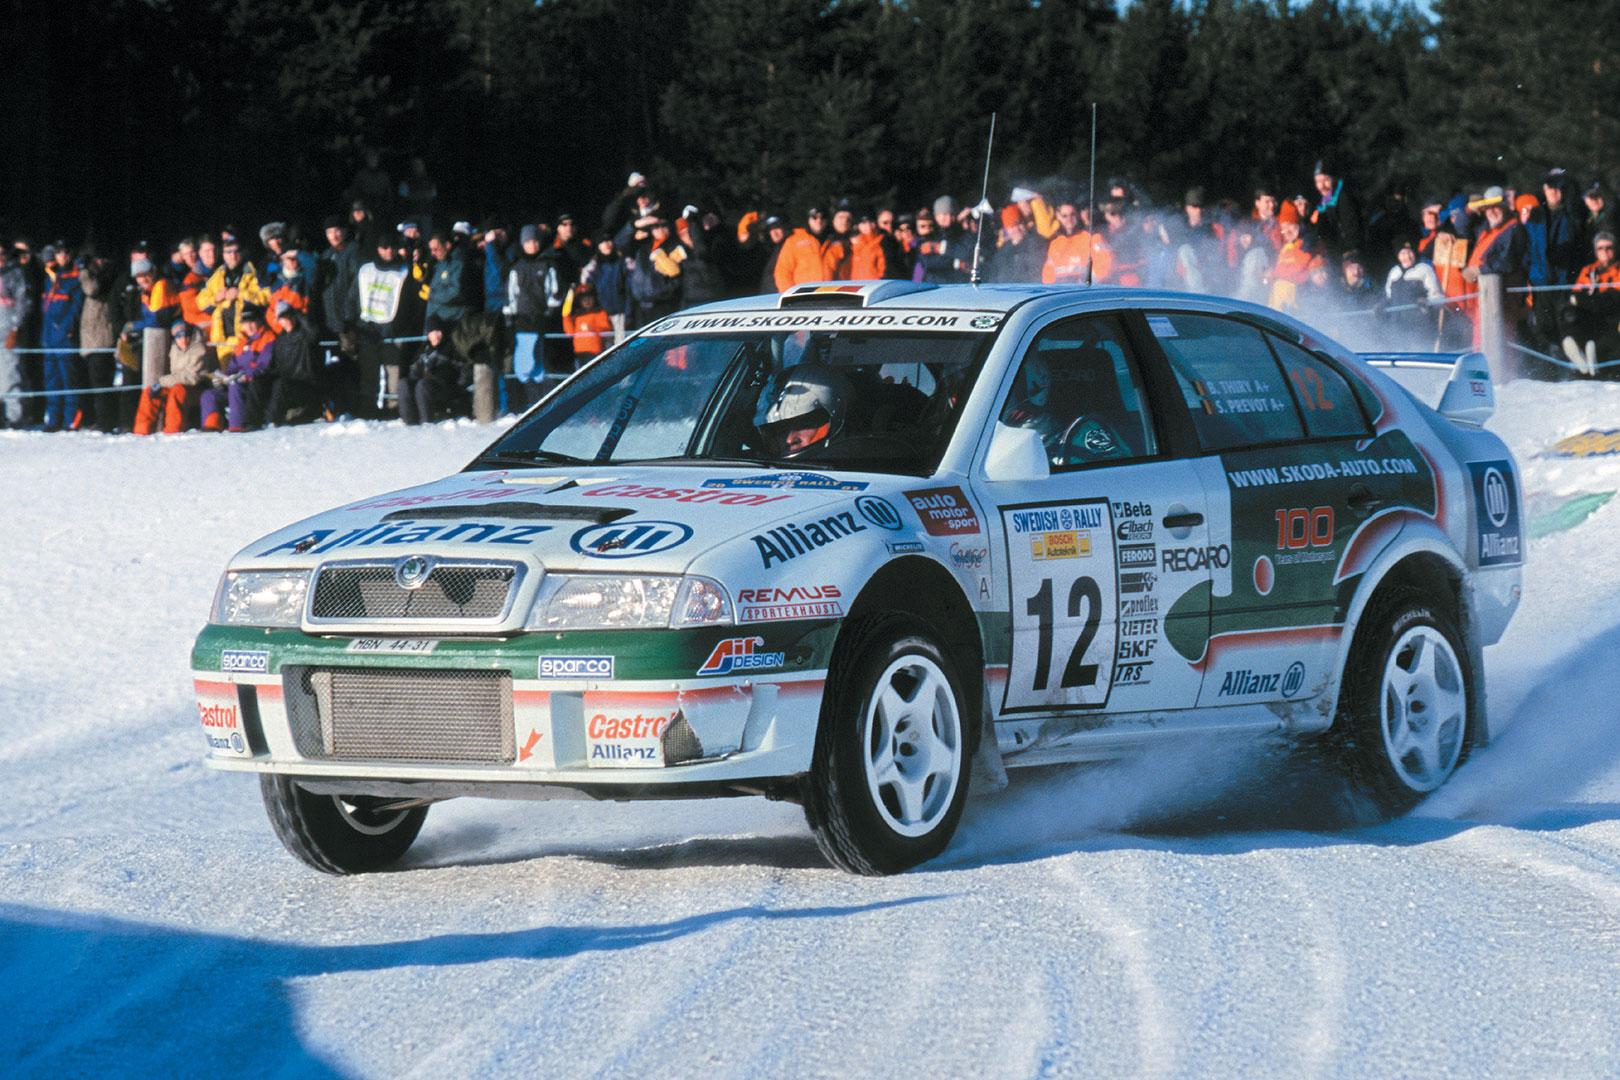 Bruno Thiry / Stéphane Prévot, ŠKODA OCTAVIA WRC, ŠKODA Motorsport. Rally Sweden 2001